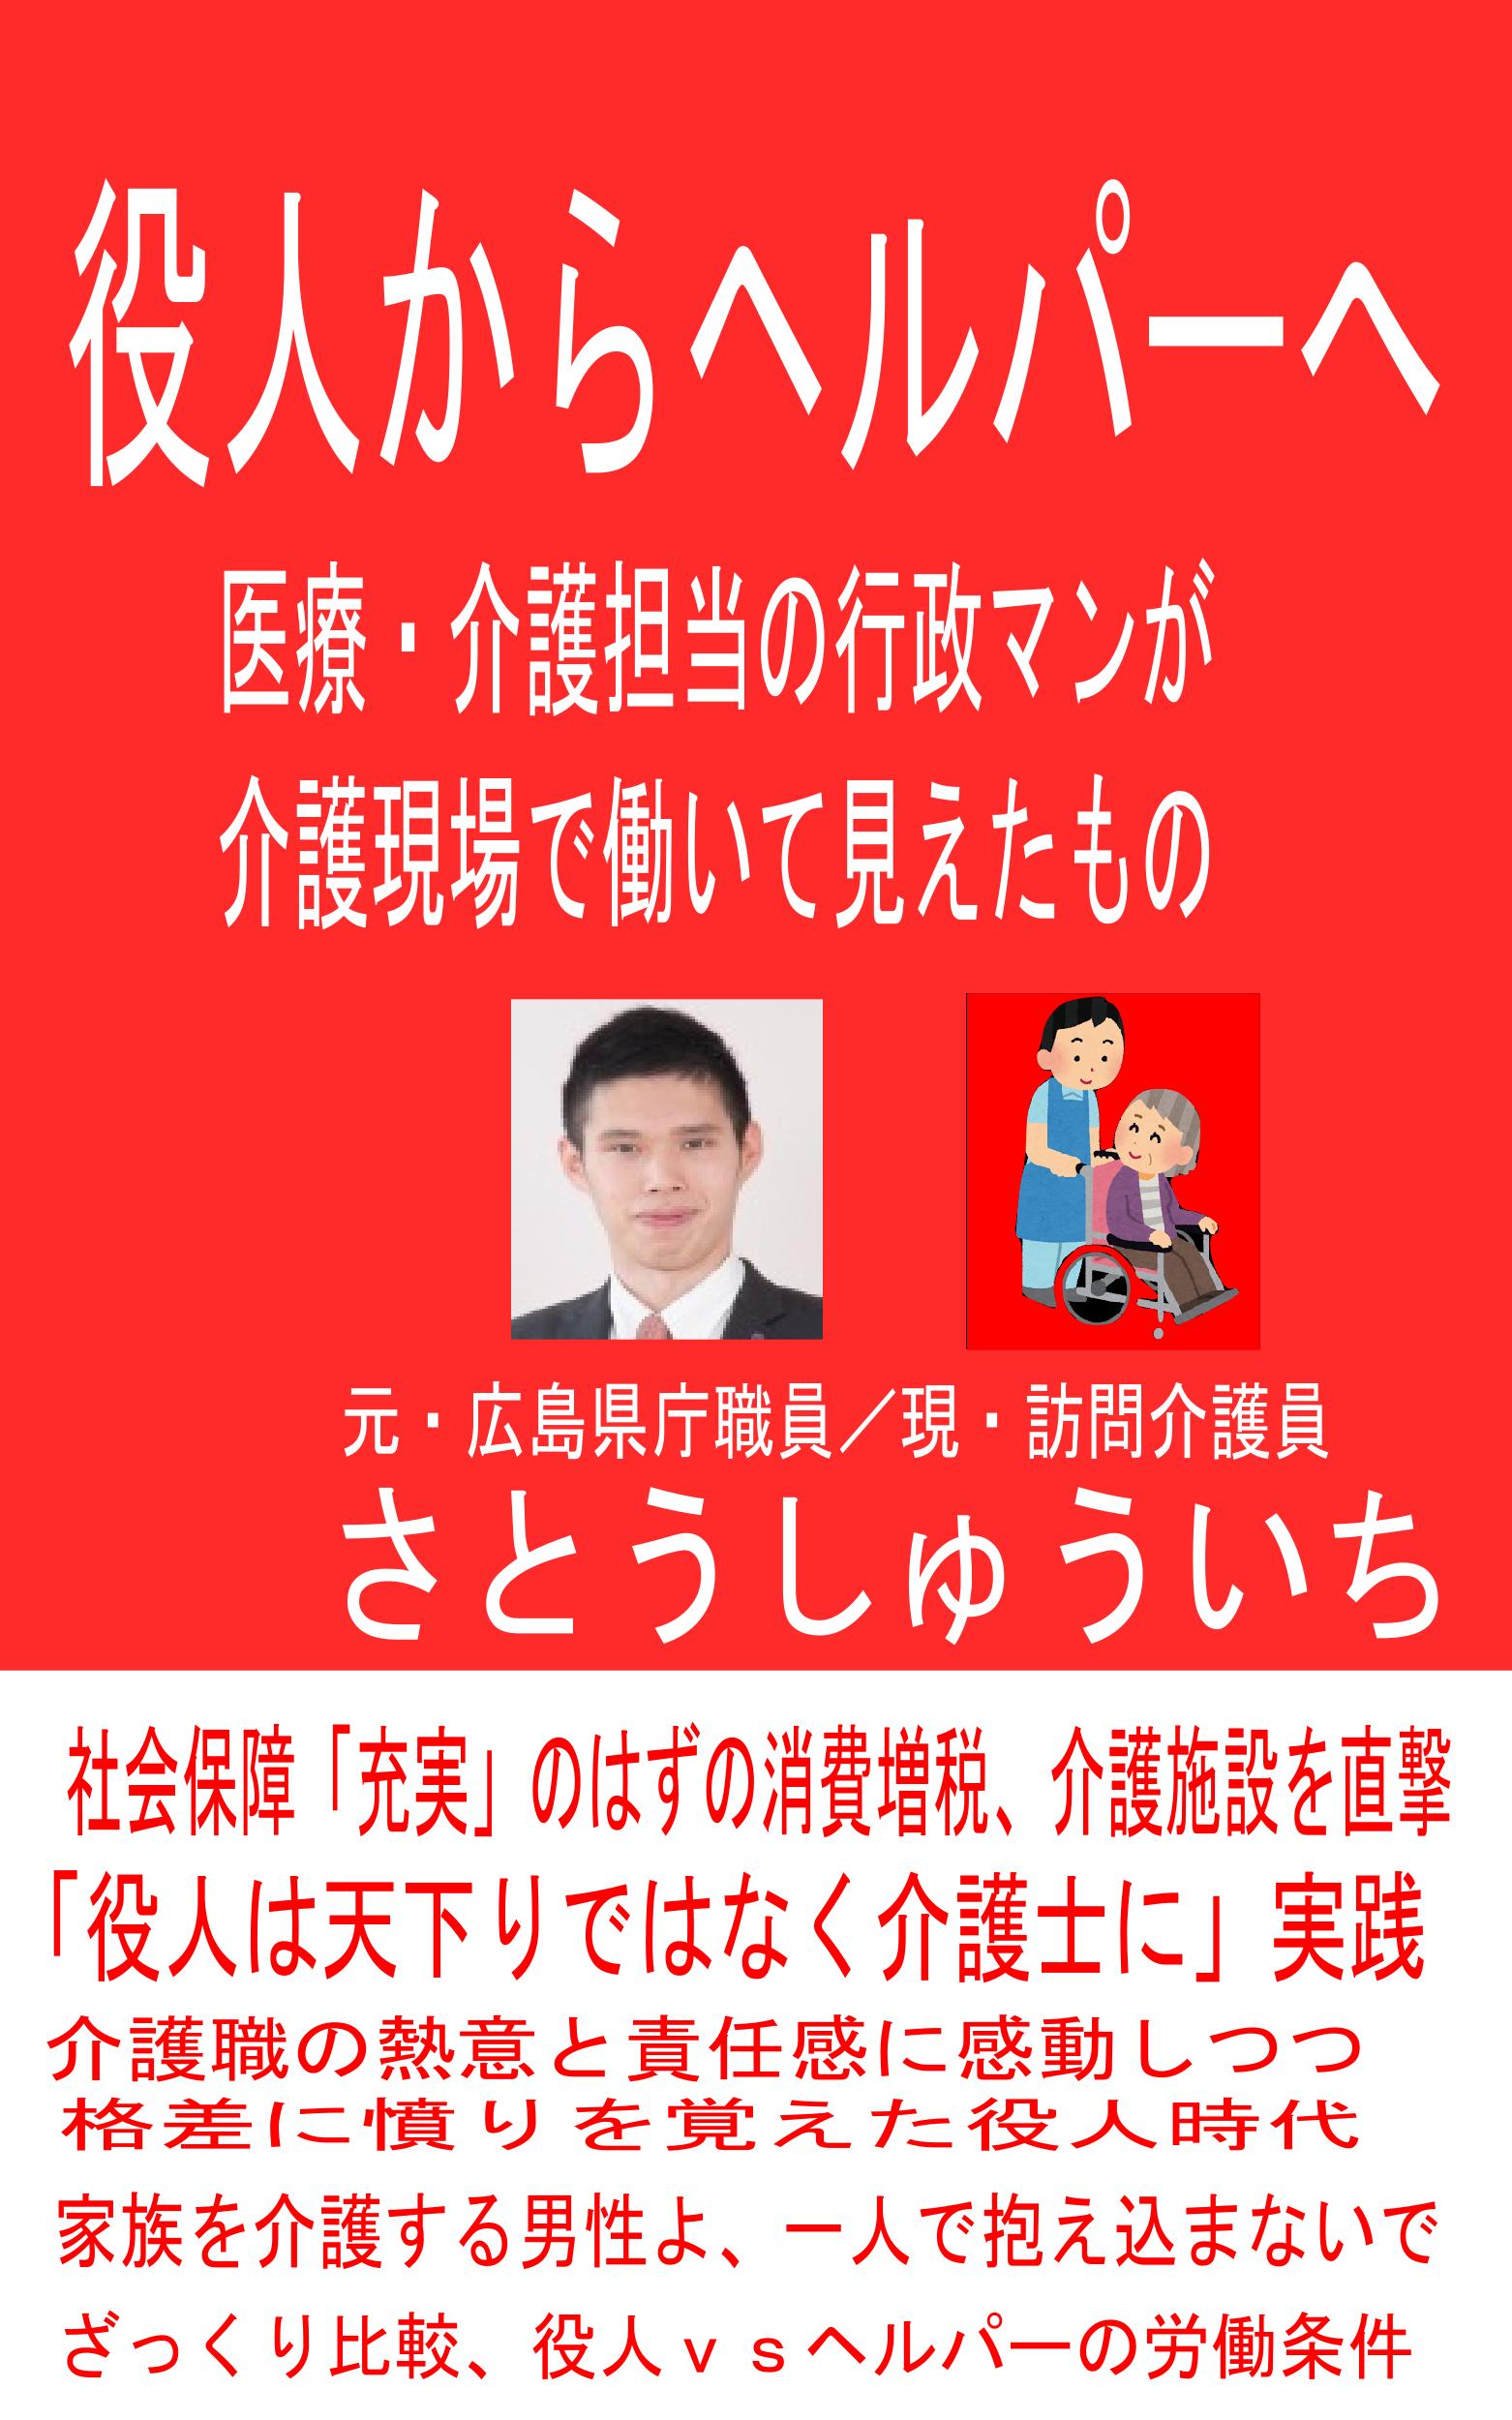 松井広島市政を斬る 11・20広島市政問題学習会_e0094315_21540365.png